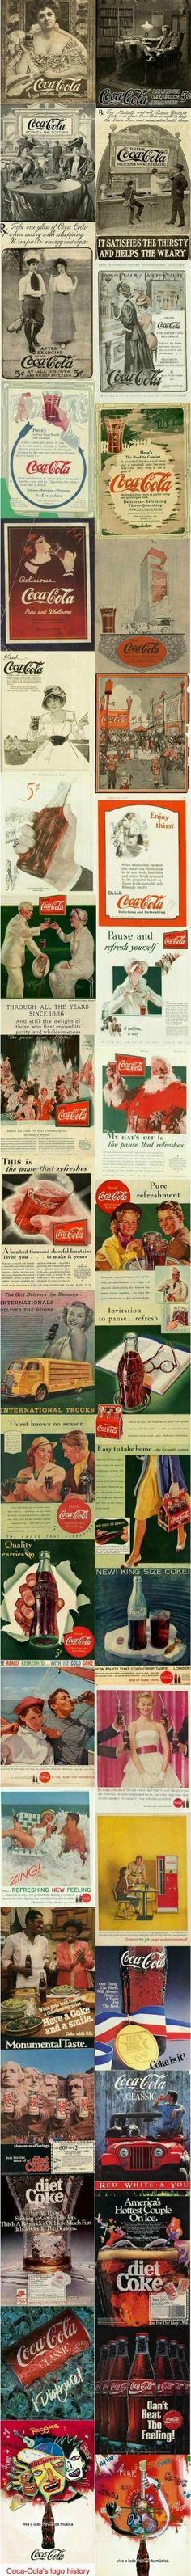 Coca Cola Old Ads: